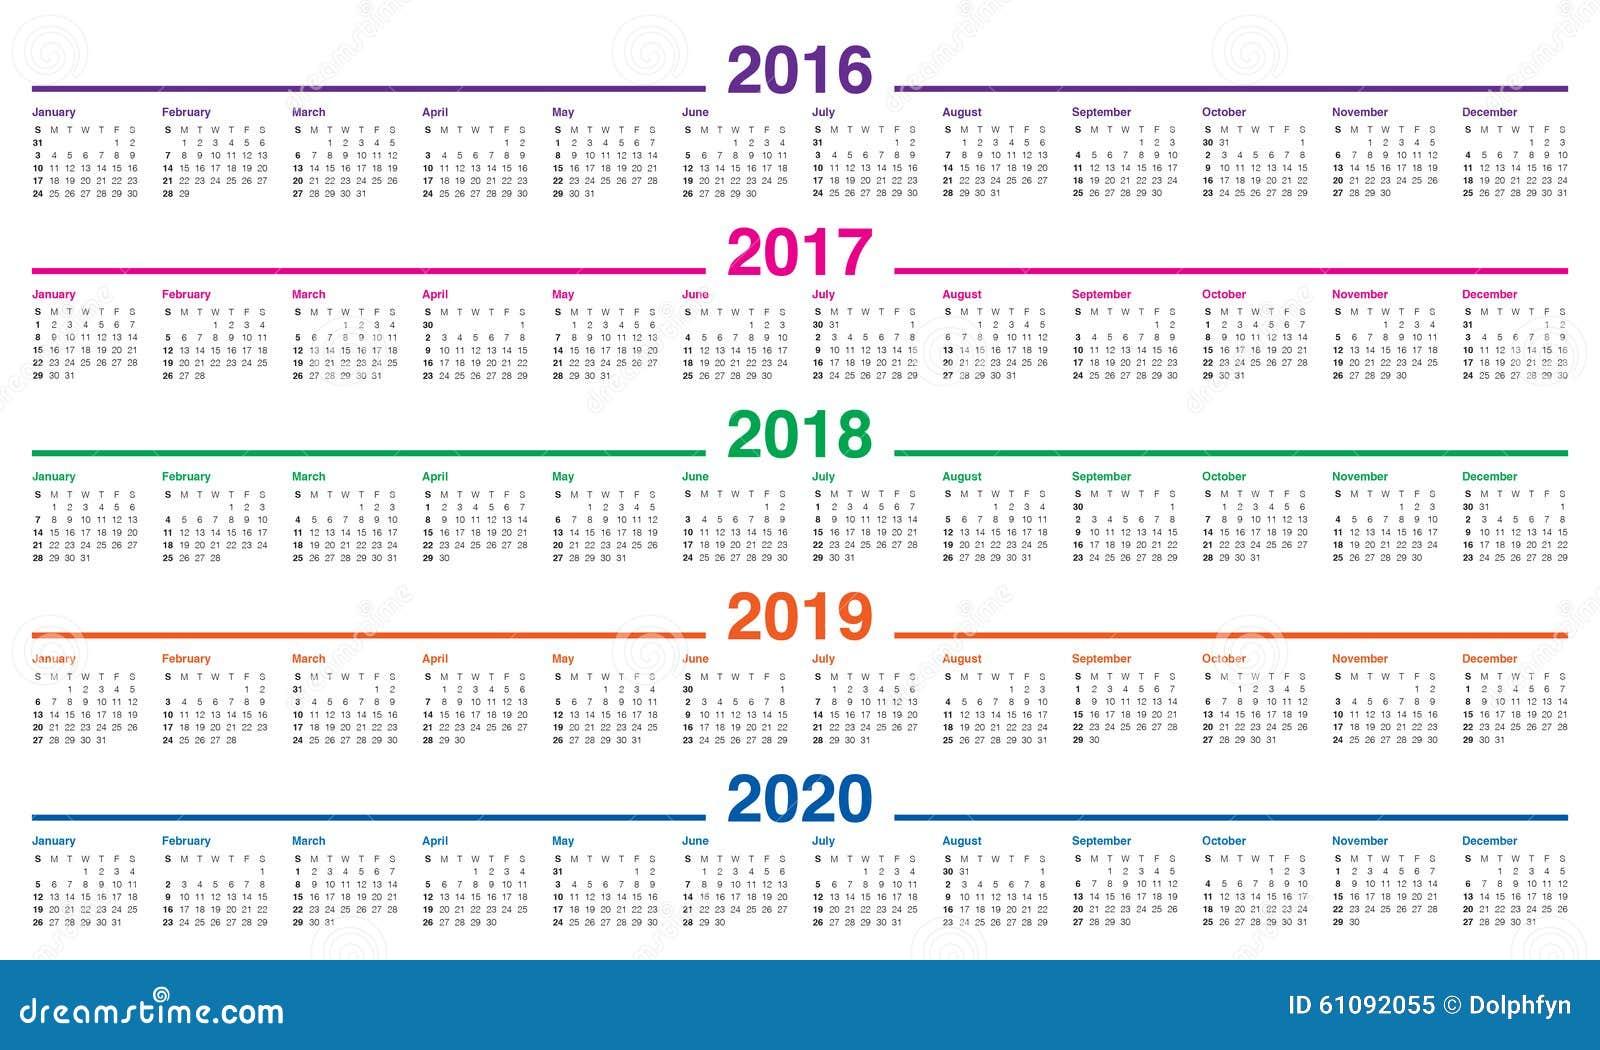 Calendrier Mensuel 2020 2019.Calendrier 2016 2017 2018 2019 2020 Illustration De Vecteur